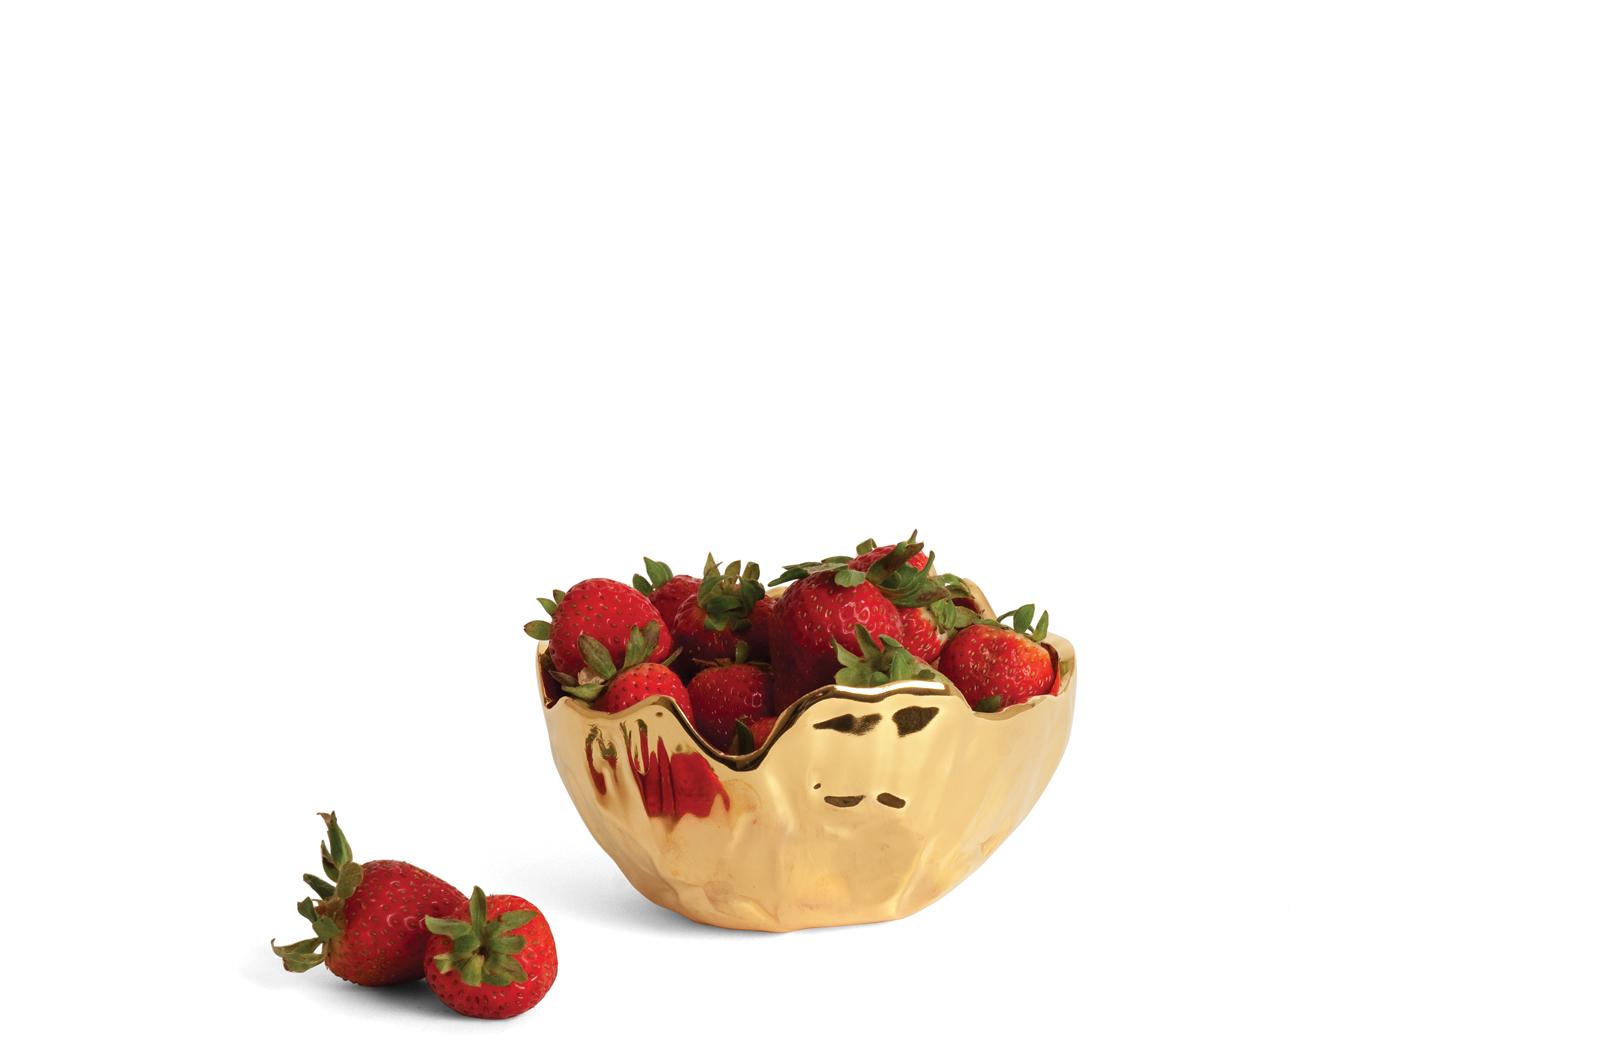 ridge goldsmall strawberries